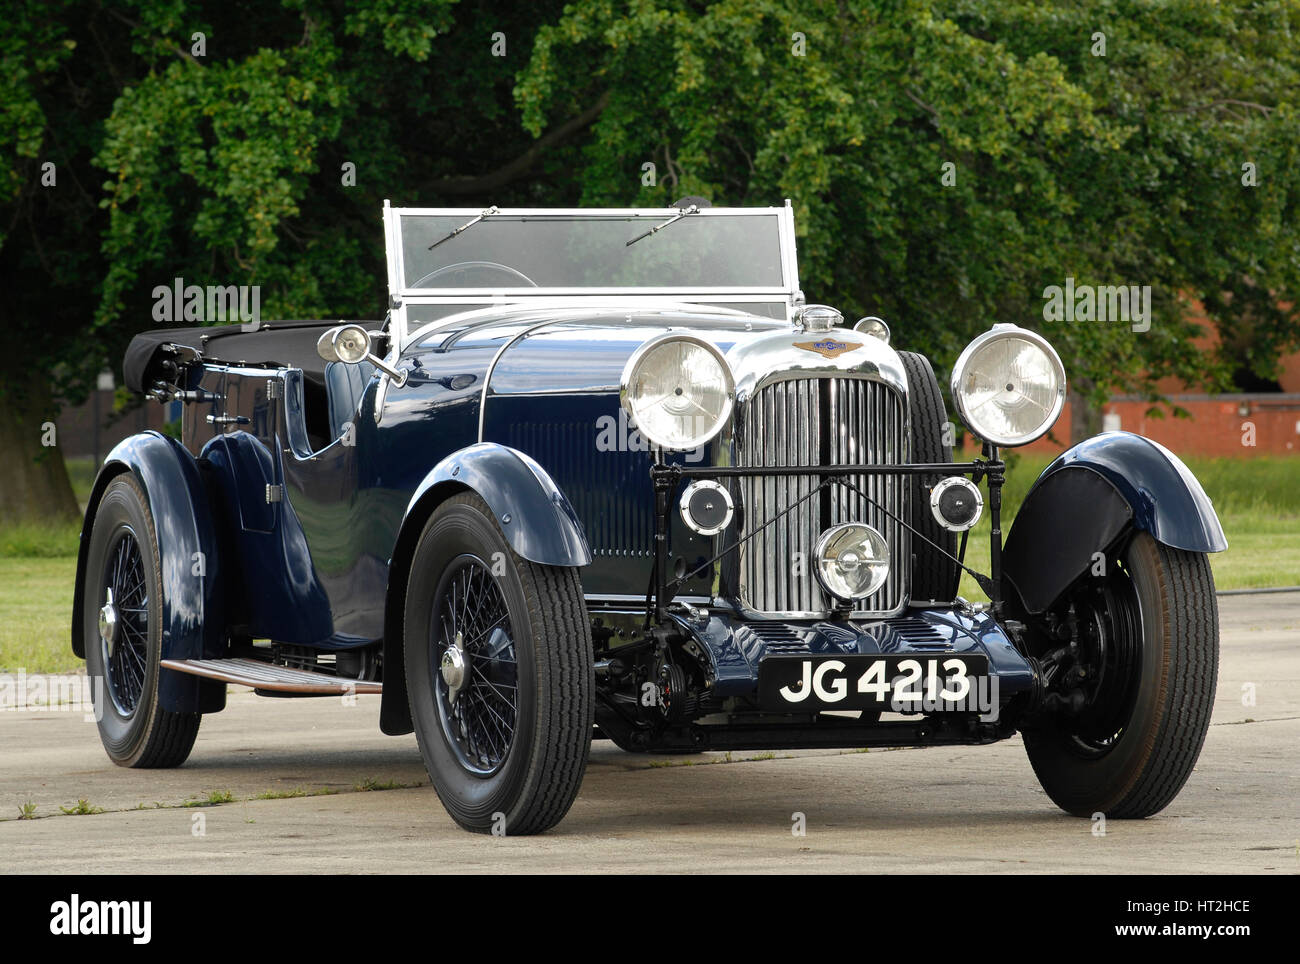 1934 Lagonda 16-80 T2 Special Tourer Artist: Unknown. - Stock Image